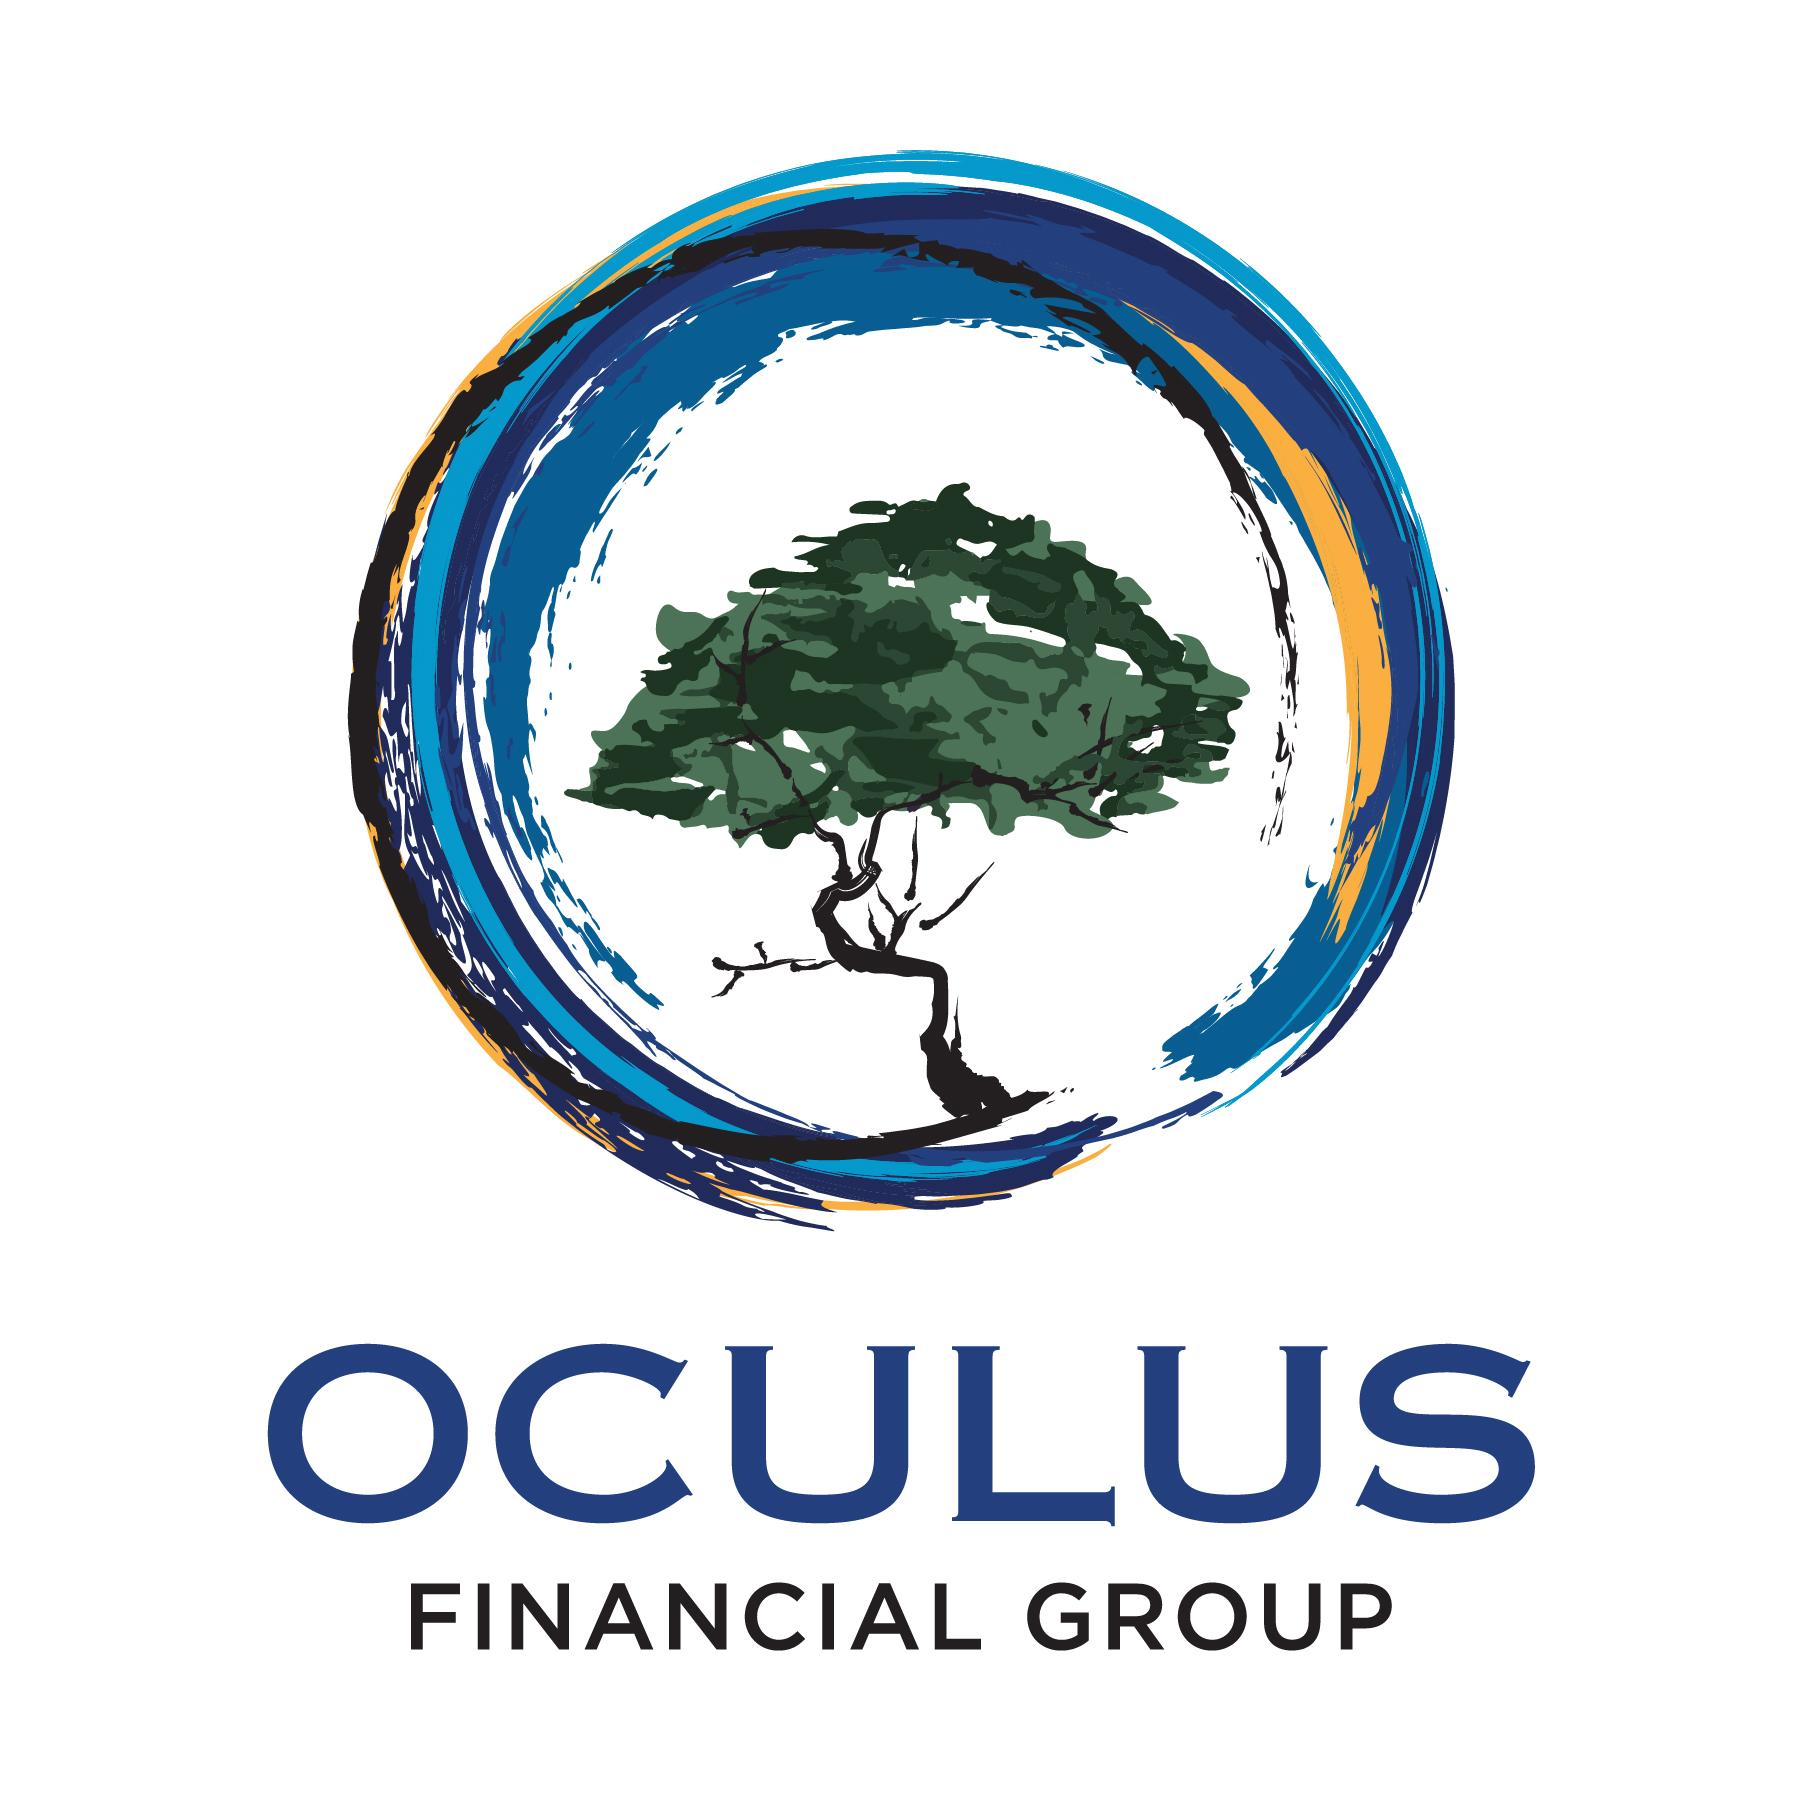 Oculus Financial Group logo